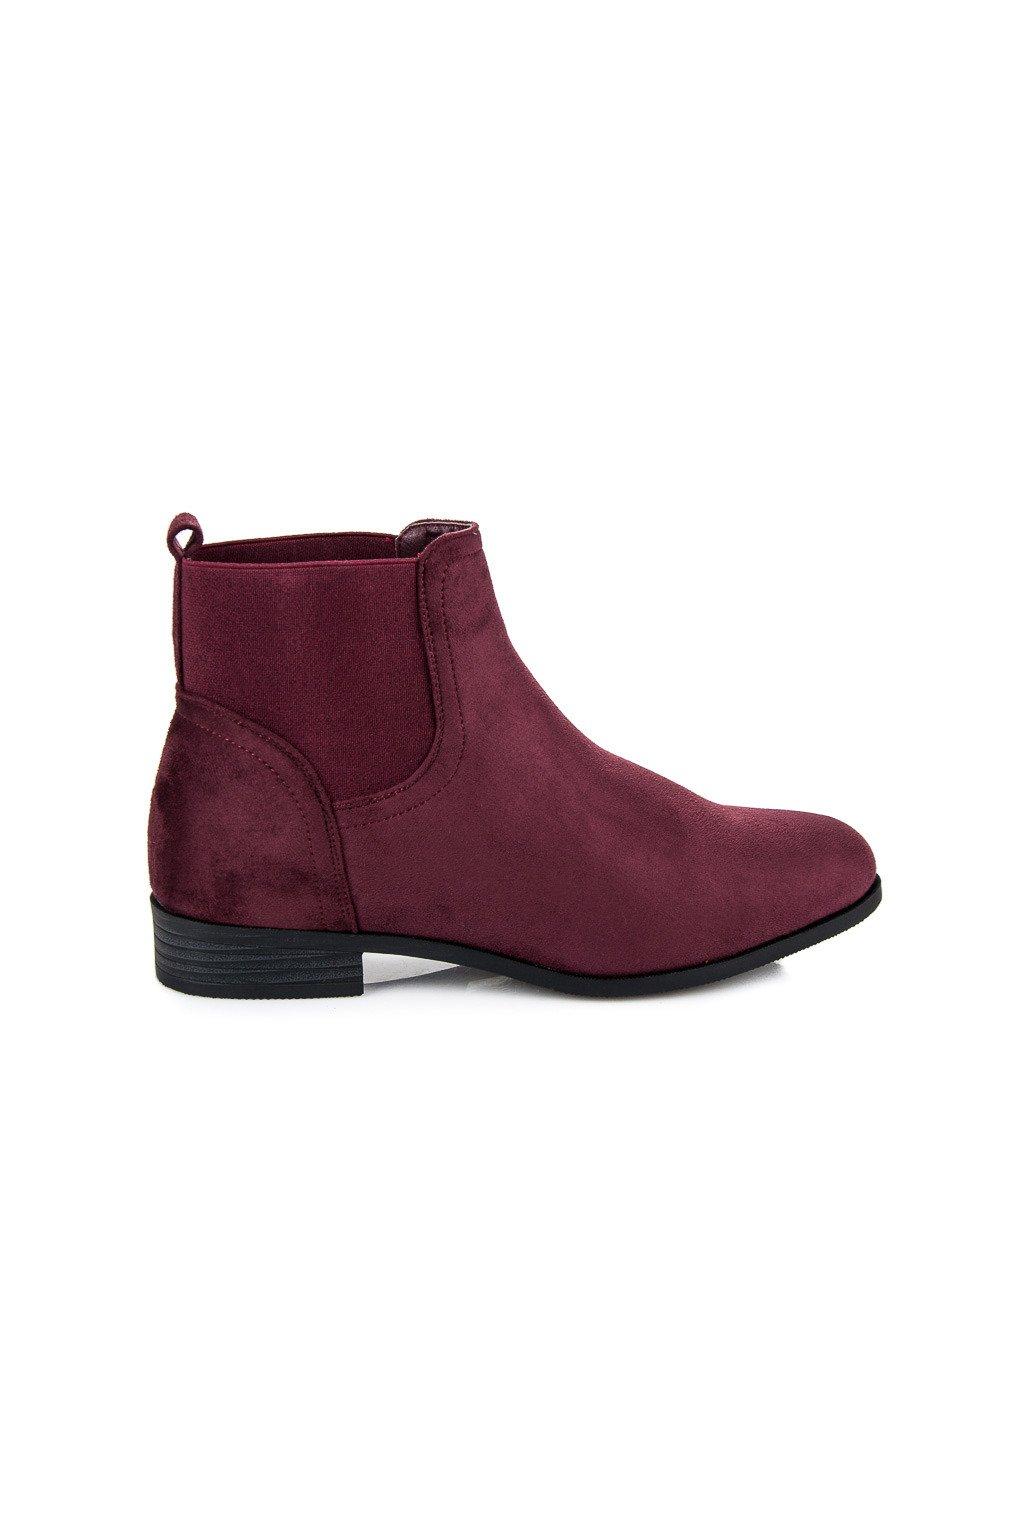 cd90ca7fd71c1 Zimná obuv baťa | NAJ.SK